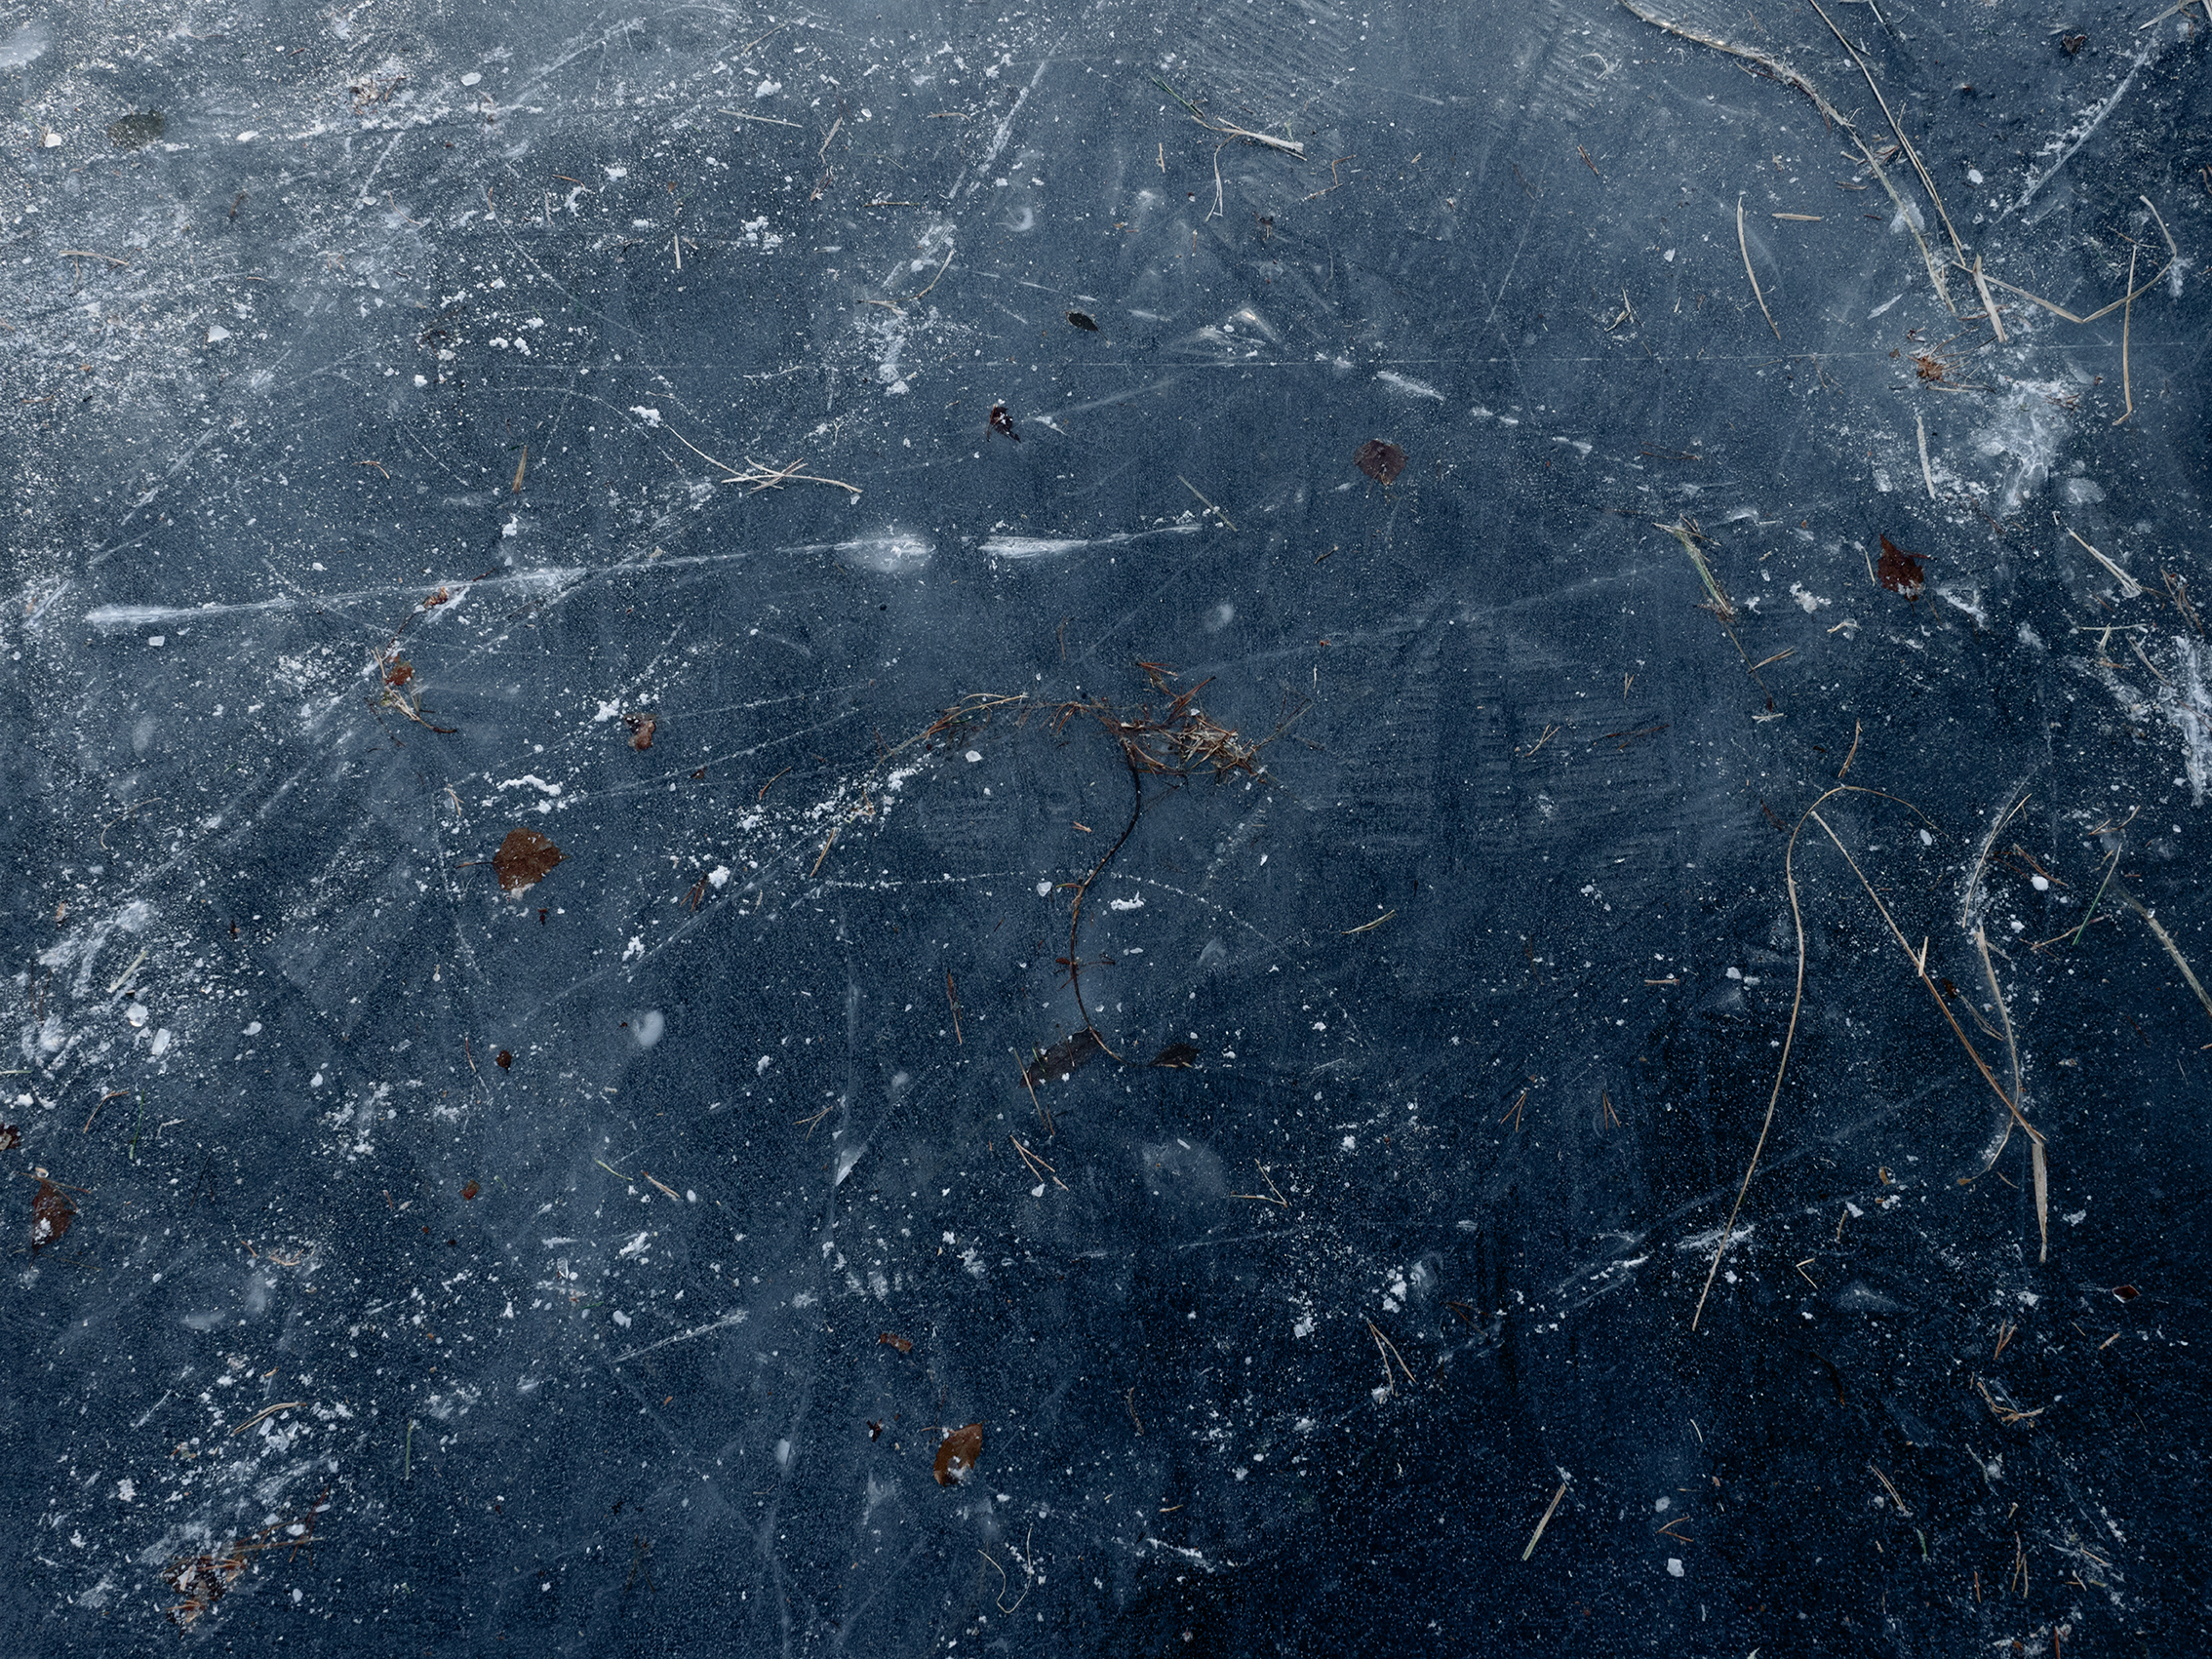 cosmos_C280124.jpg